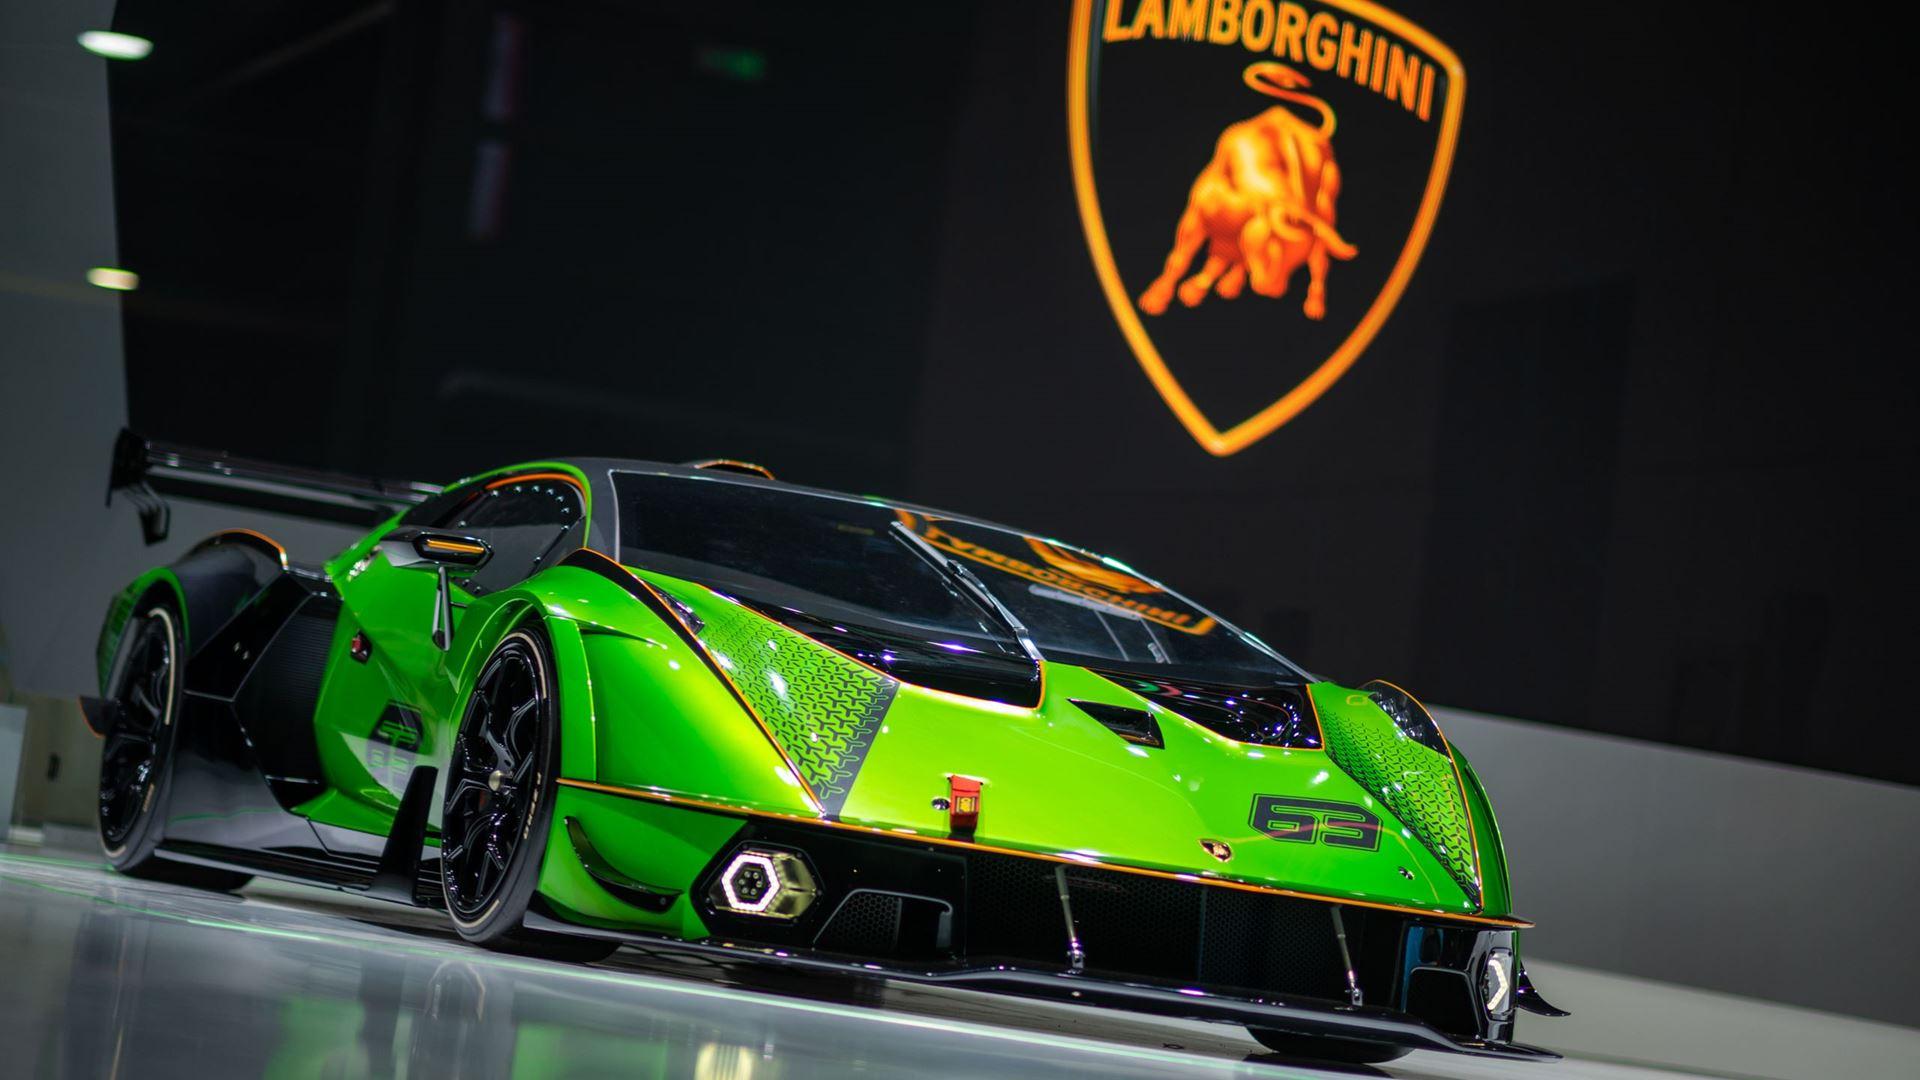 Three premieres for Automobili Lamborghini at the 2021 Shanghai Auto Show - Image 1